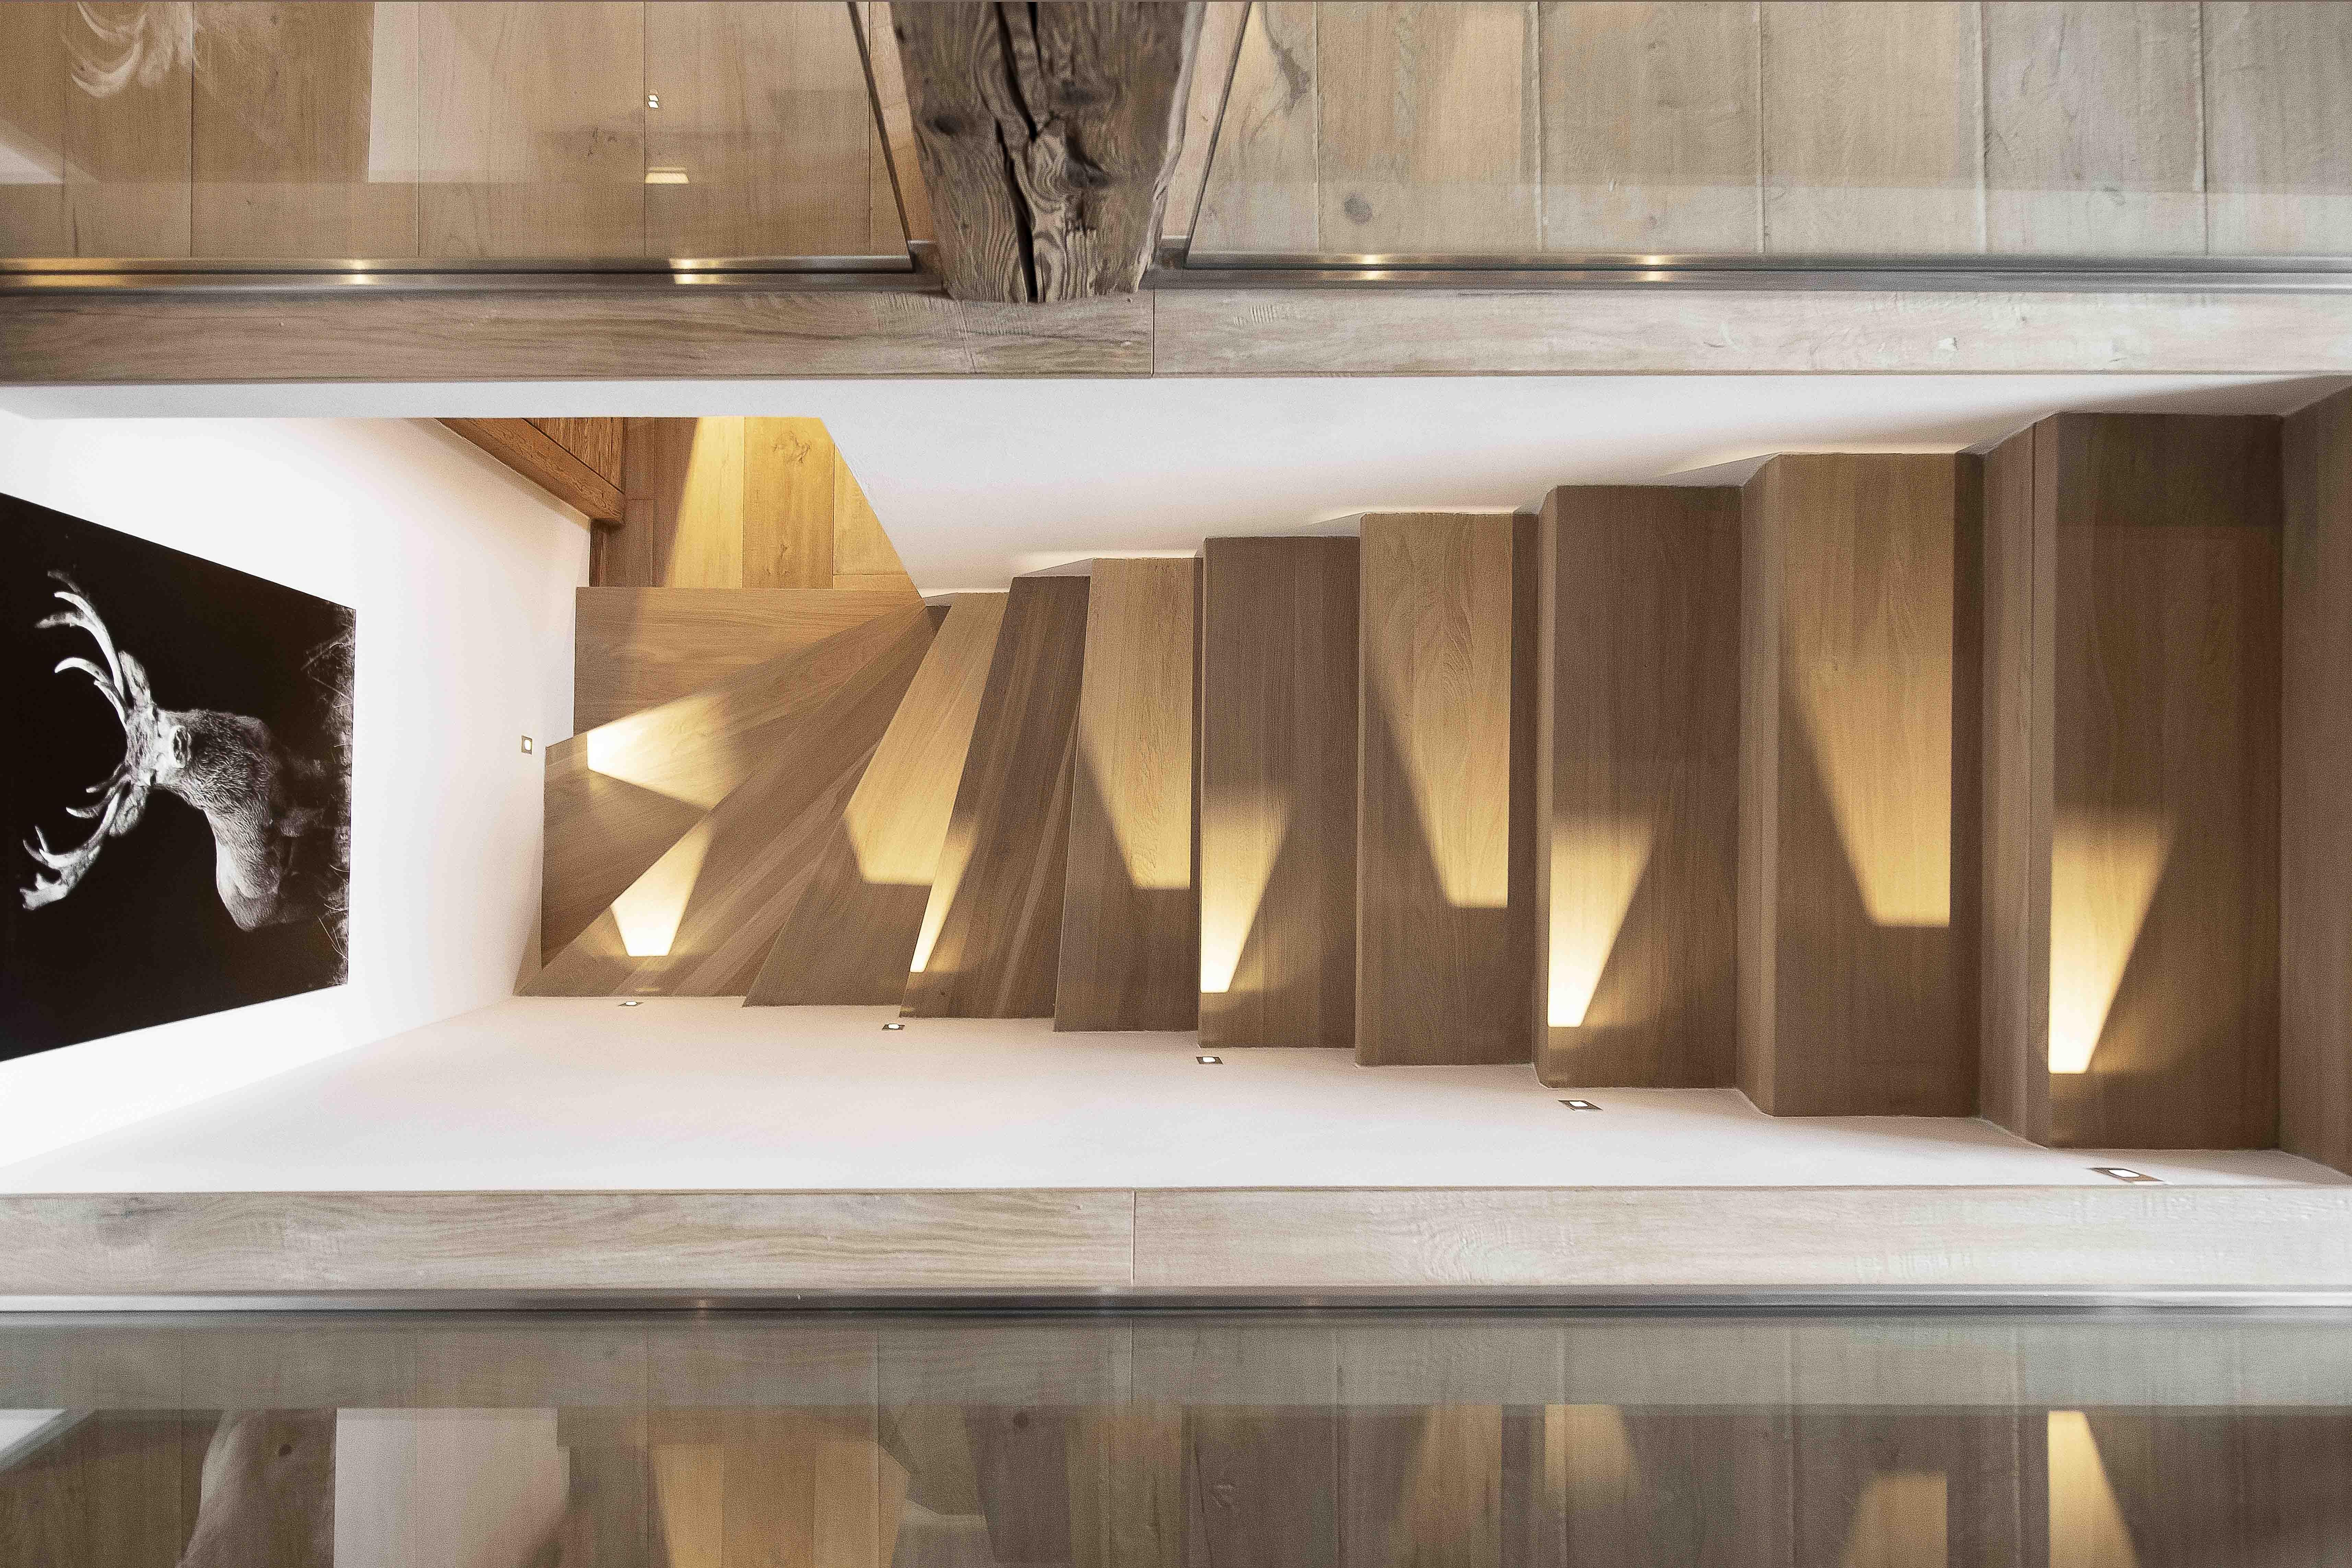 Ecole De Design Annecy alp'architecture sàrl | linkedin